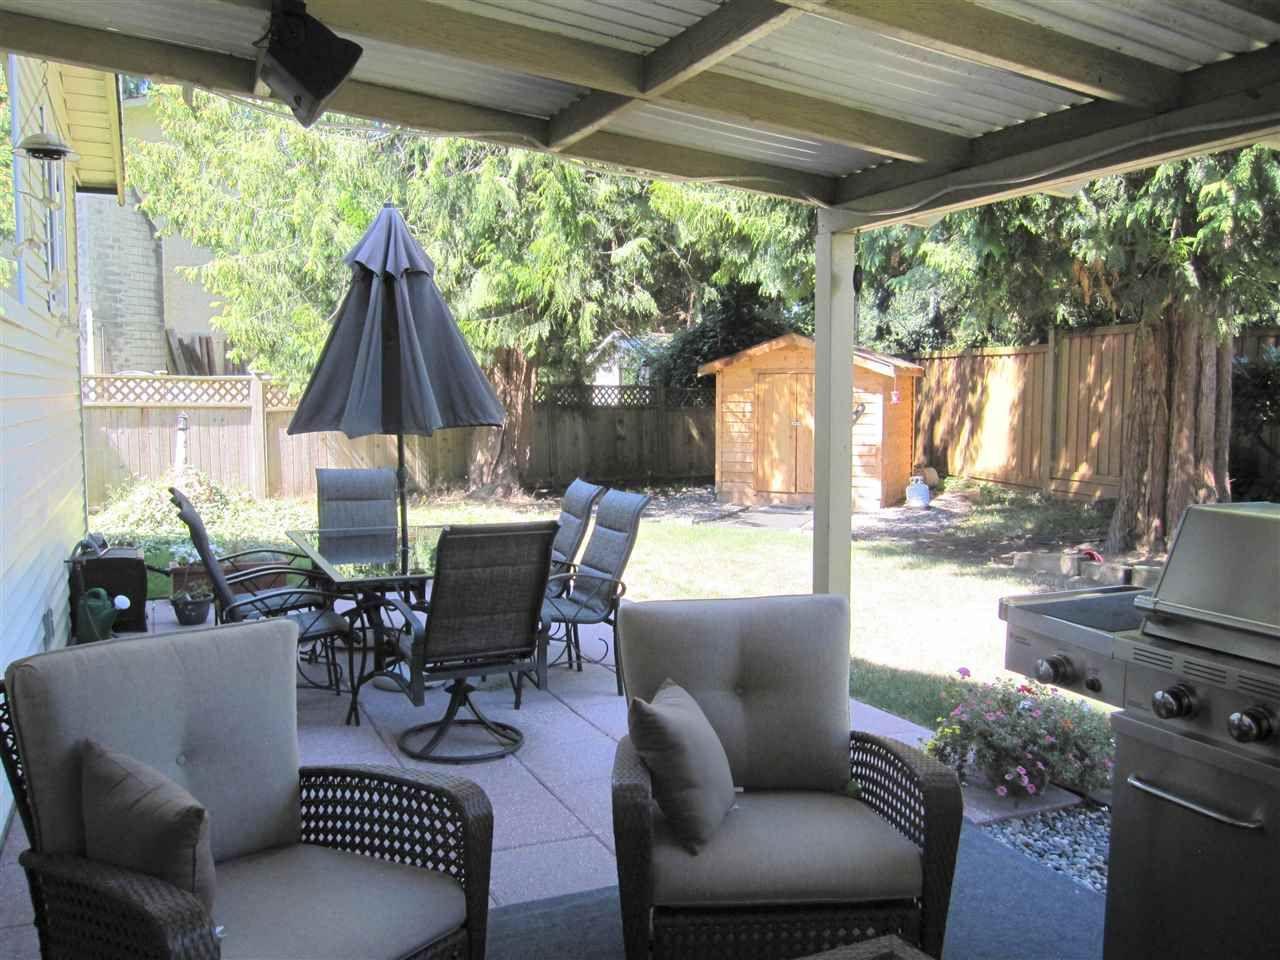 Photo 13: Photos: 21155 CUTLER Place in Maple Ridge: Southwest Maple Ridge House for sale : MLS®# R2101980